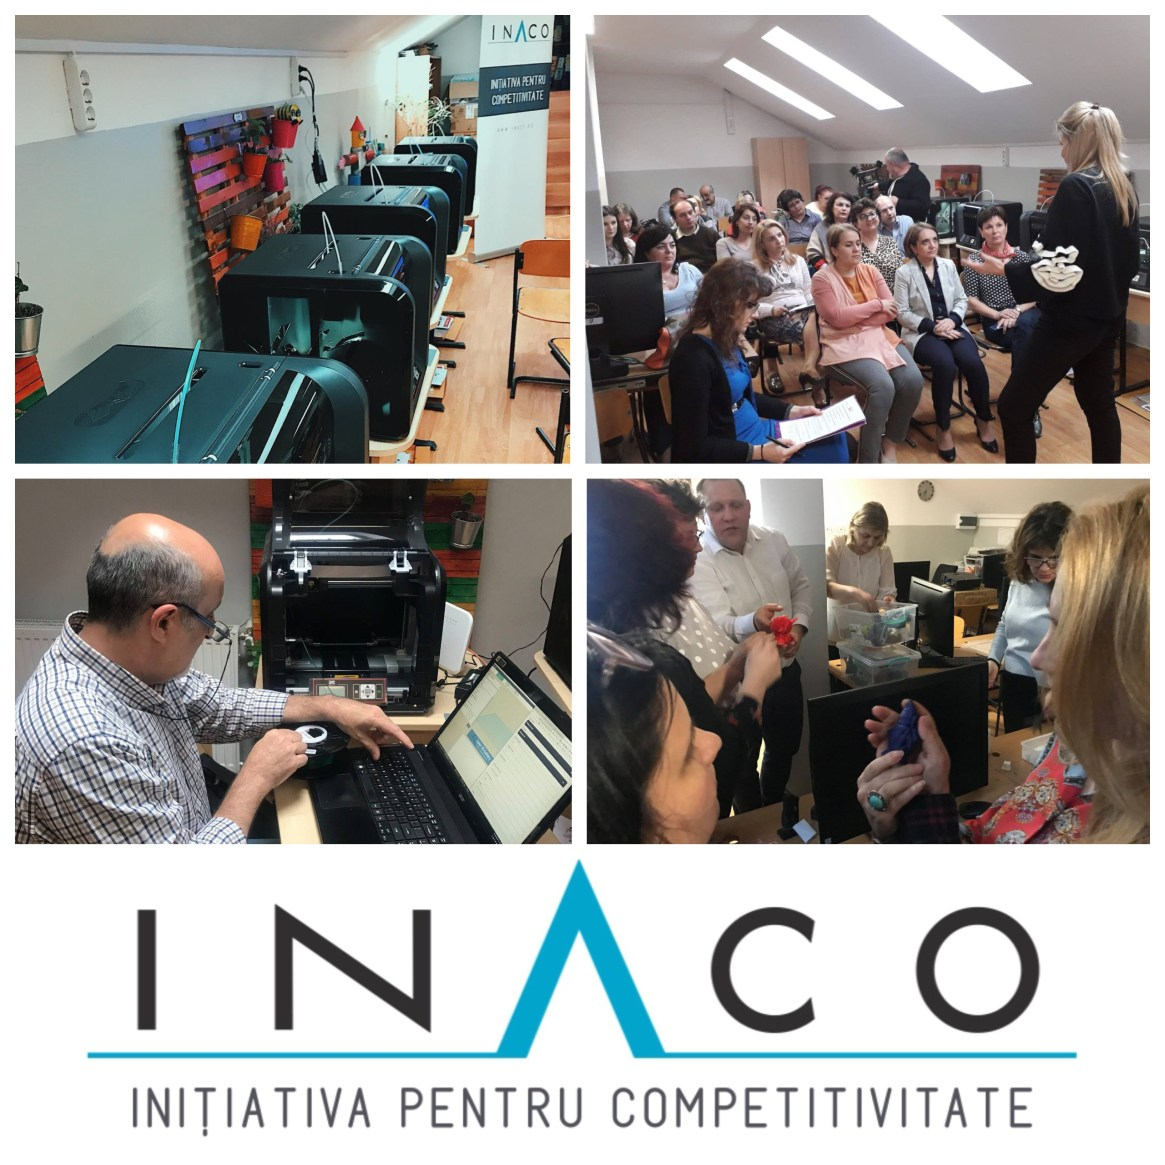 INACO a creat primul laborator inteligent Smart Lab 4.0 din școlile românești